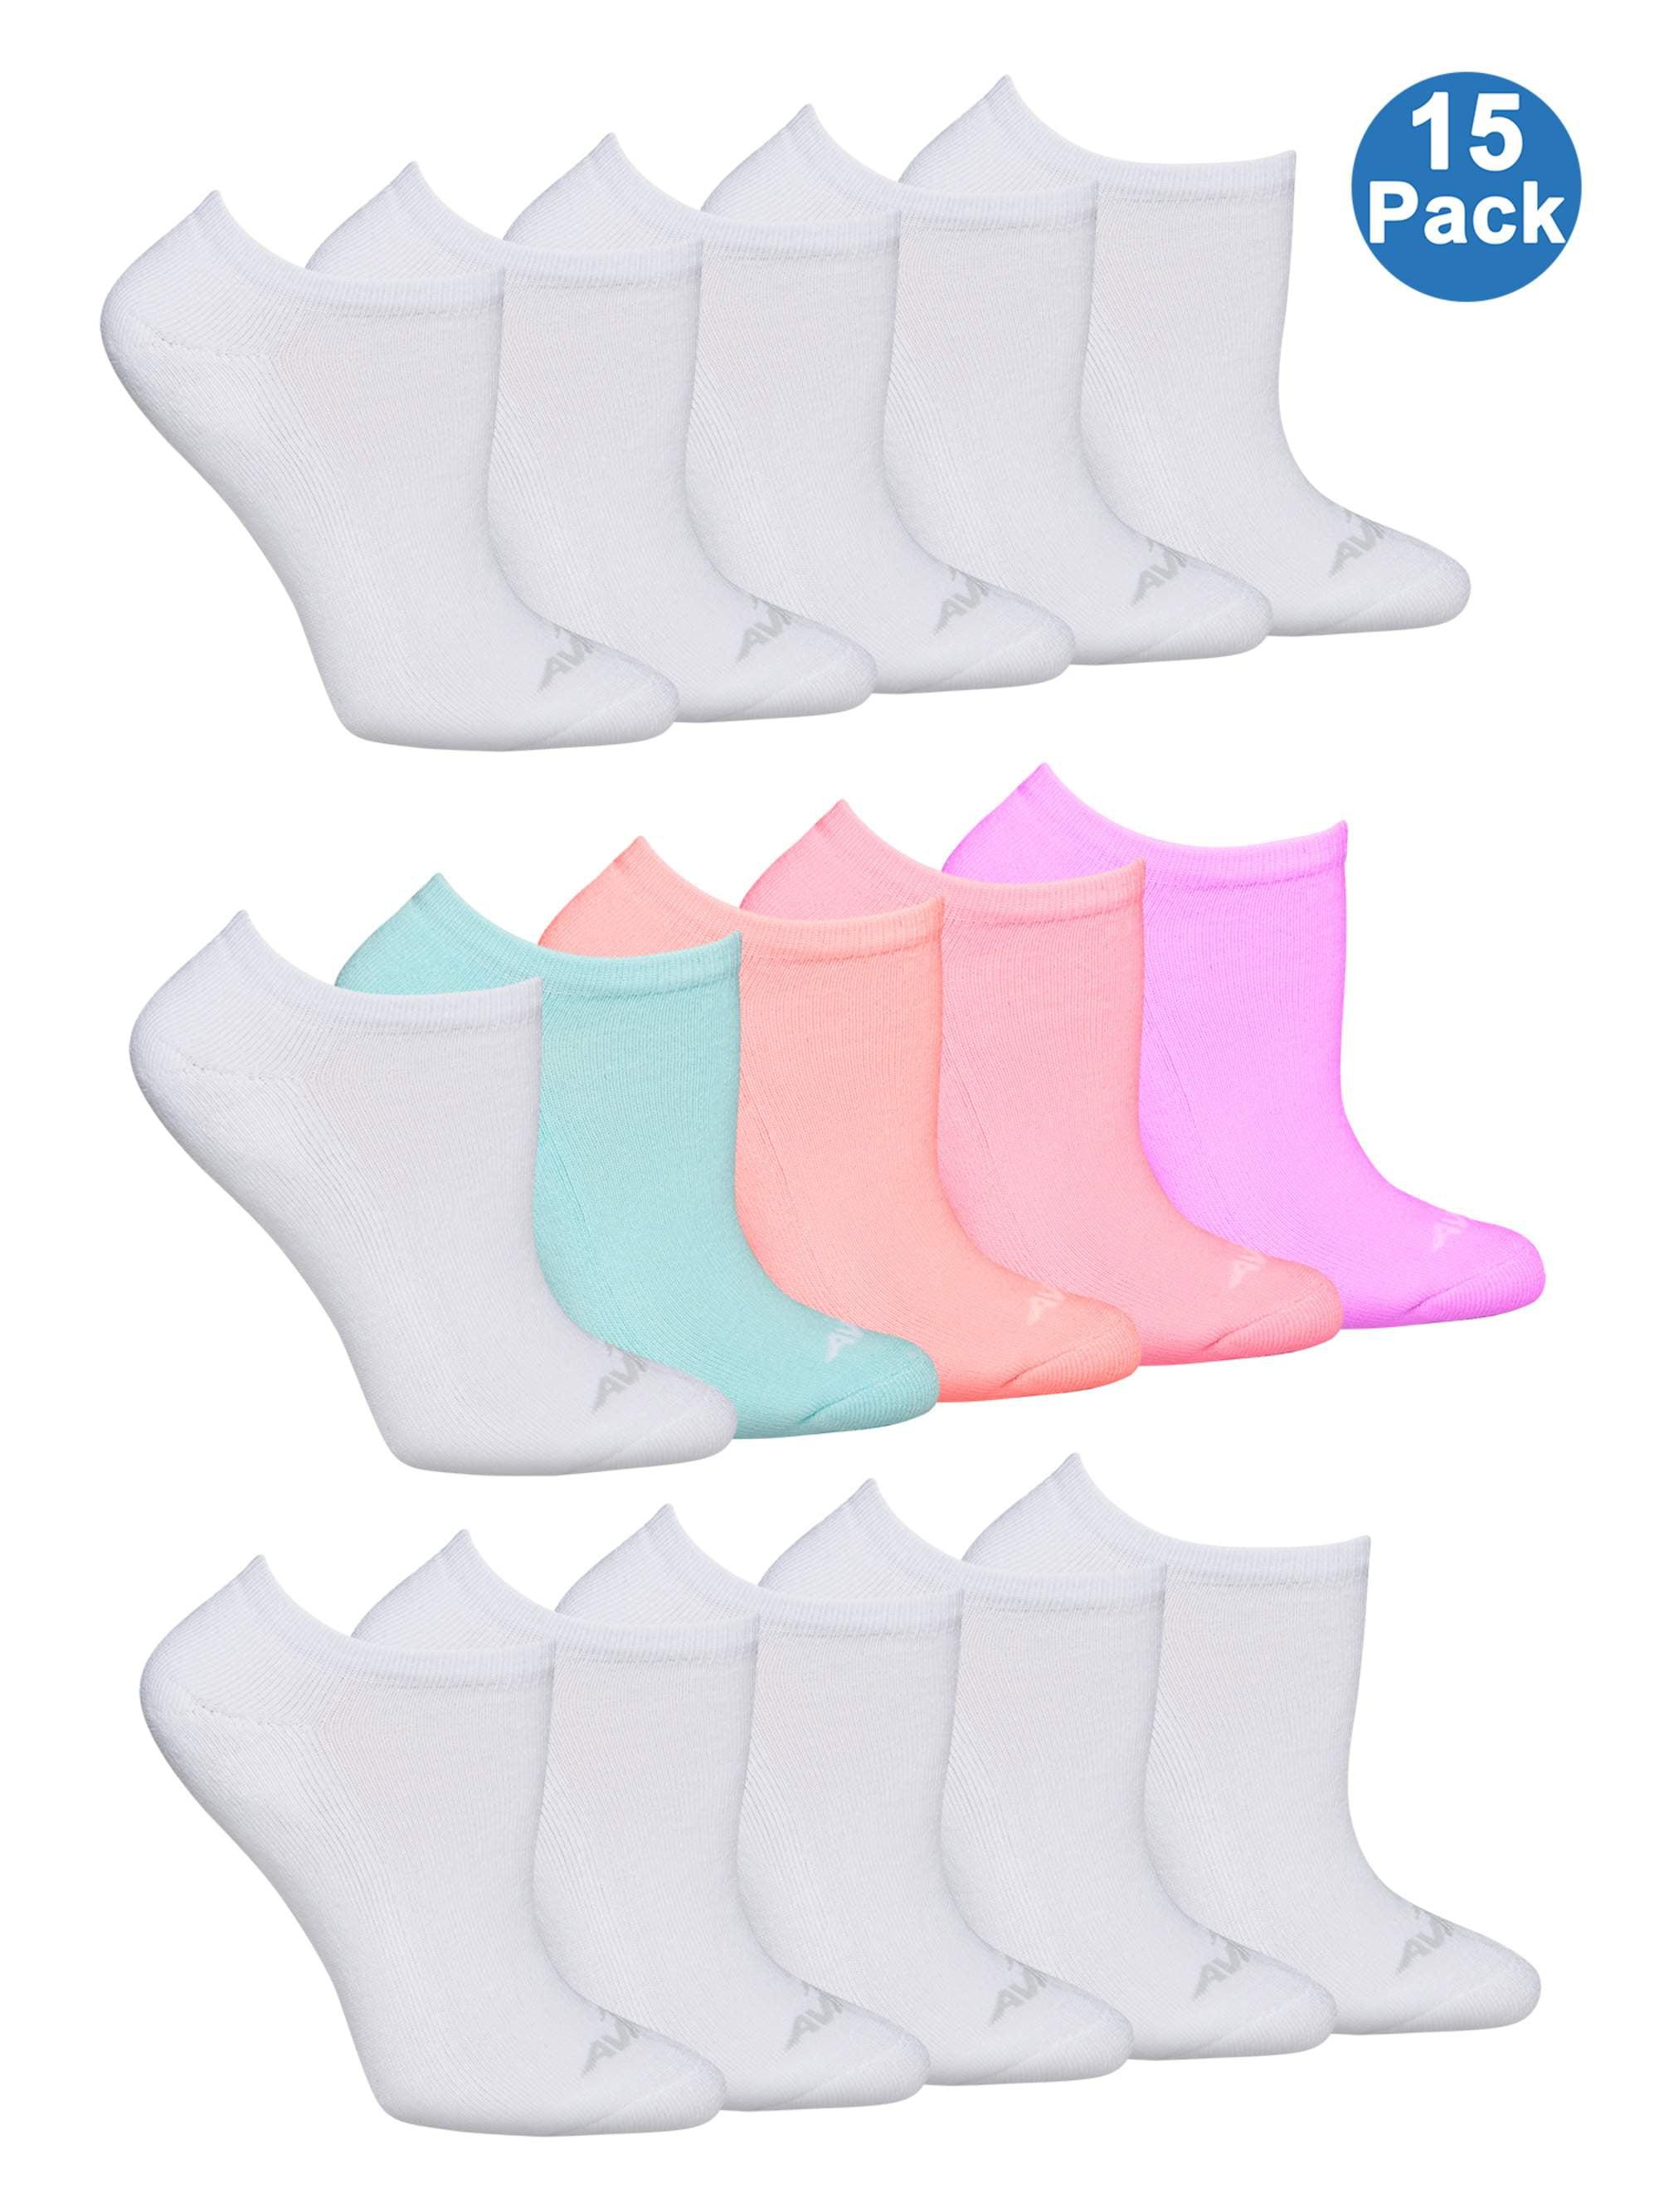 Avia Ladies No Show Sock, 15 Pack